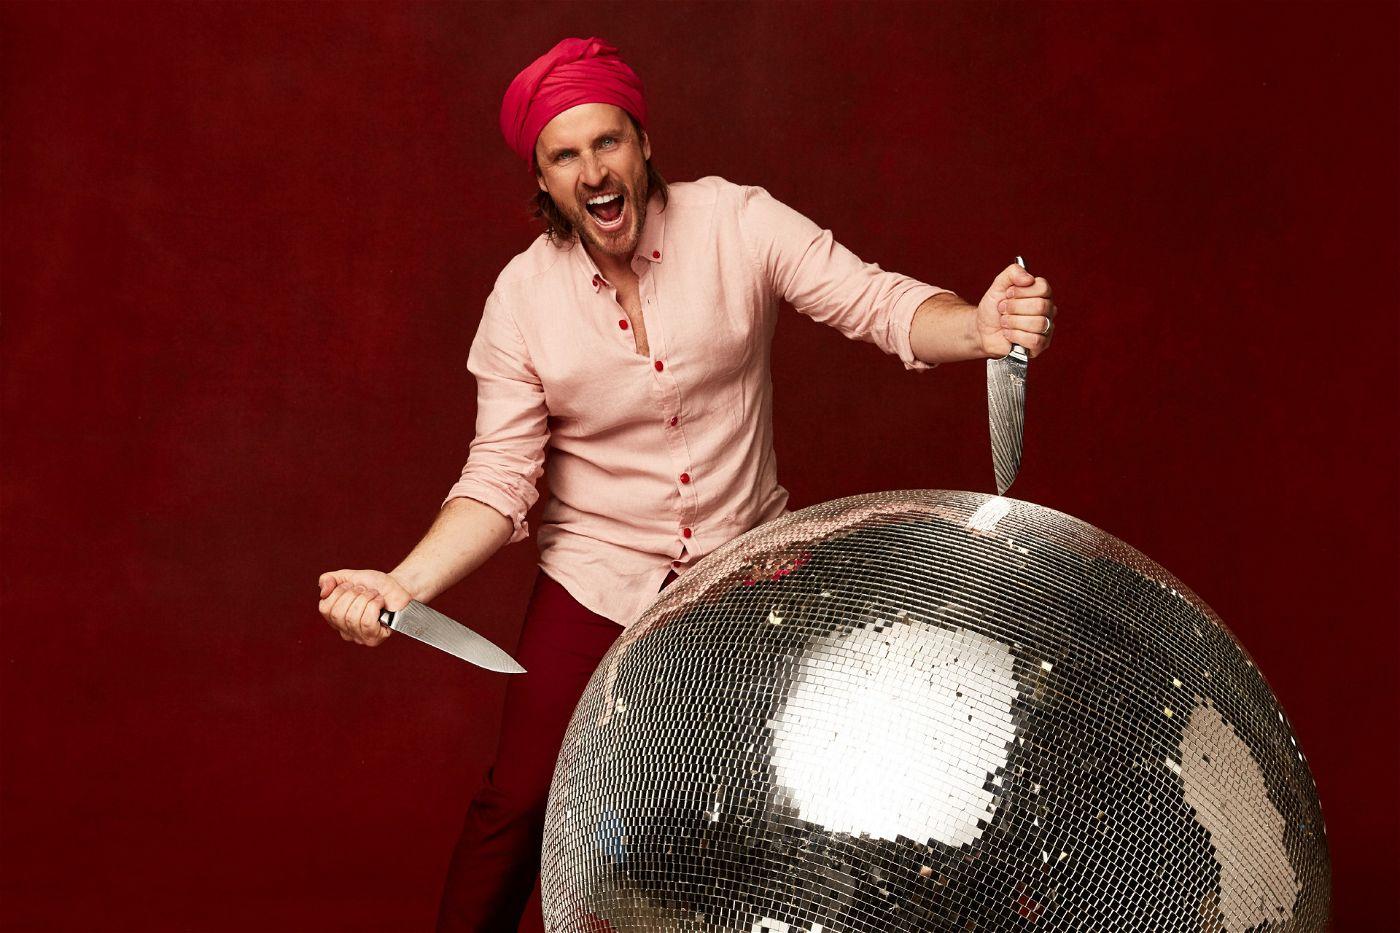 Eduardo Andrés Lopez, besser bekannt als TV-Koch Chakall, ist in Tigre bei Buenos Aires geboren worden.